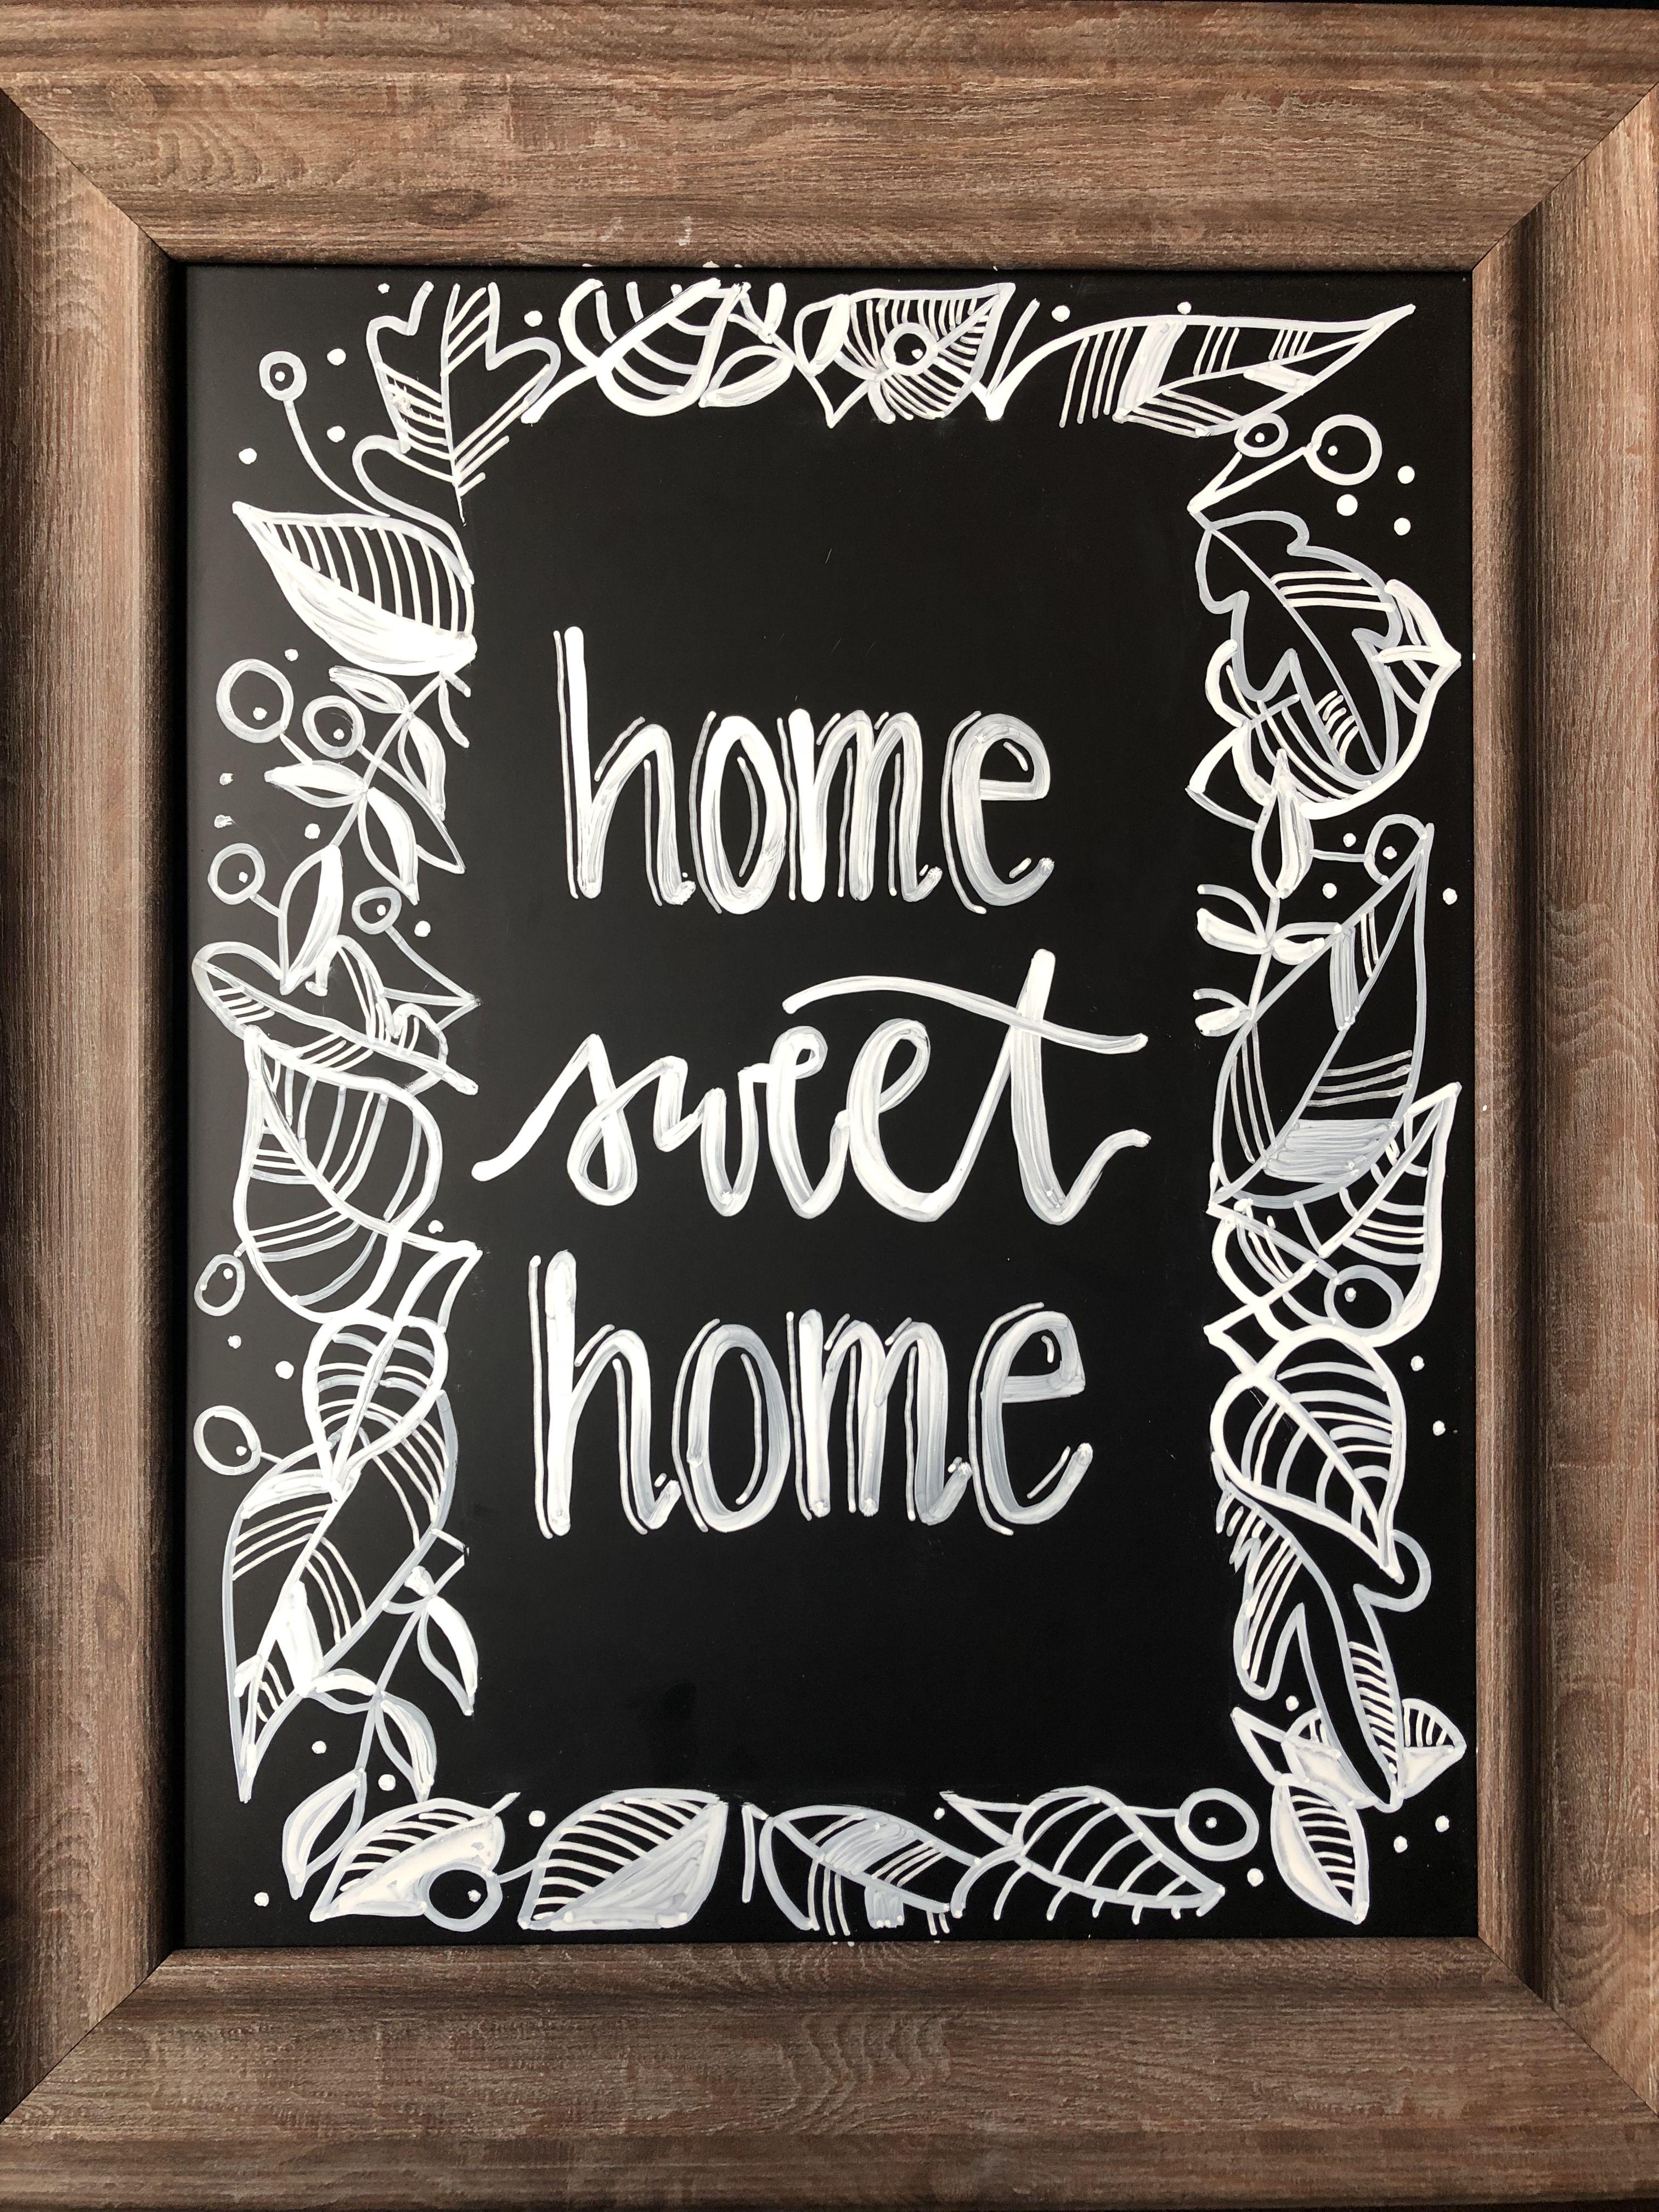 Home sweet home original chalkboard quote art art